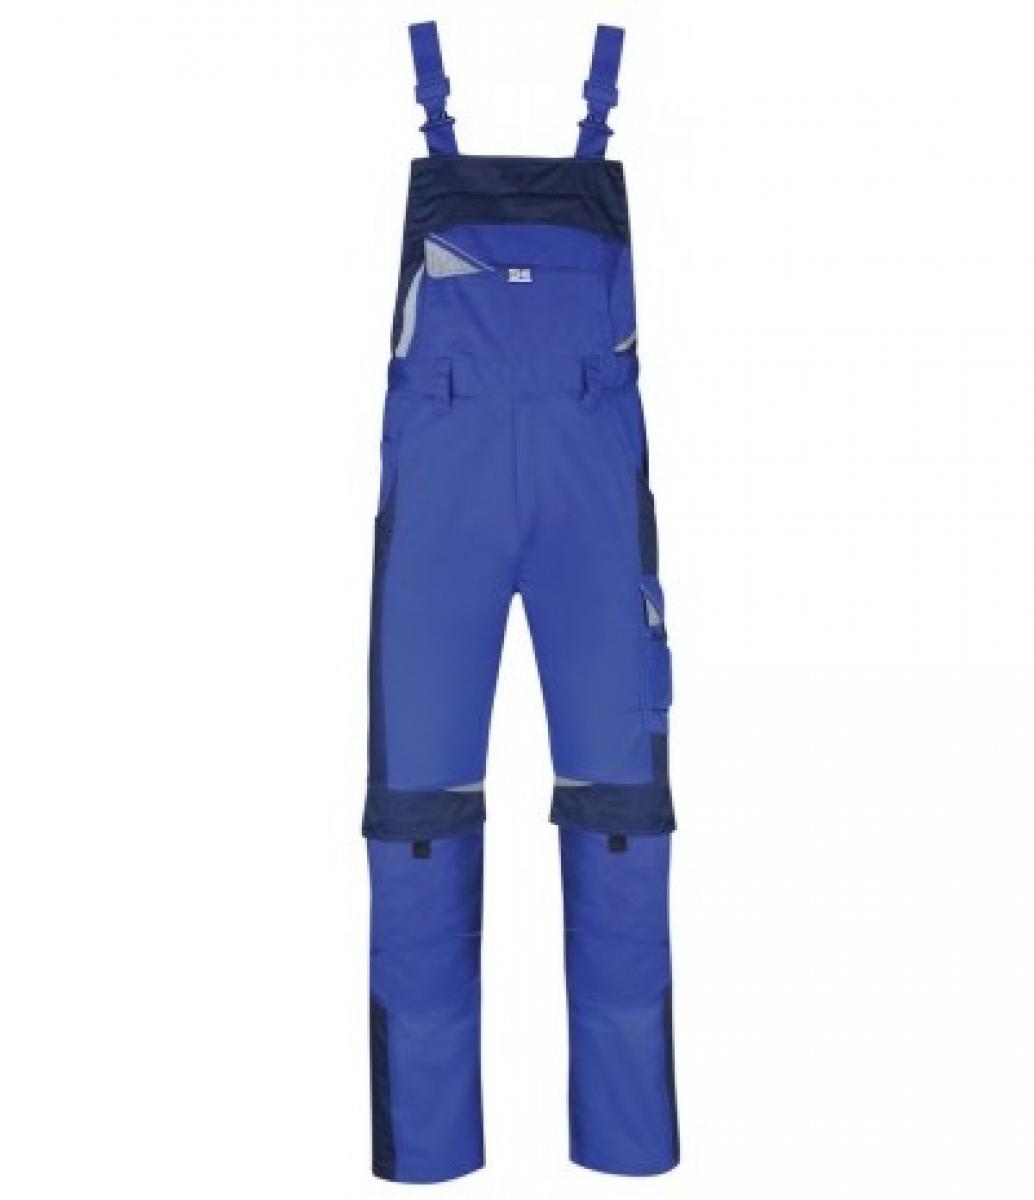 PKA Arbeits-Berufs-Latz-Hose Bestwork, MG250, kornblau/hydronblau